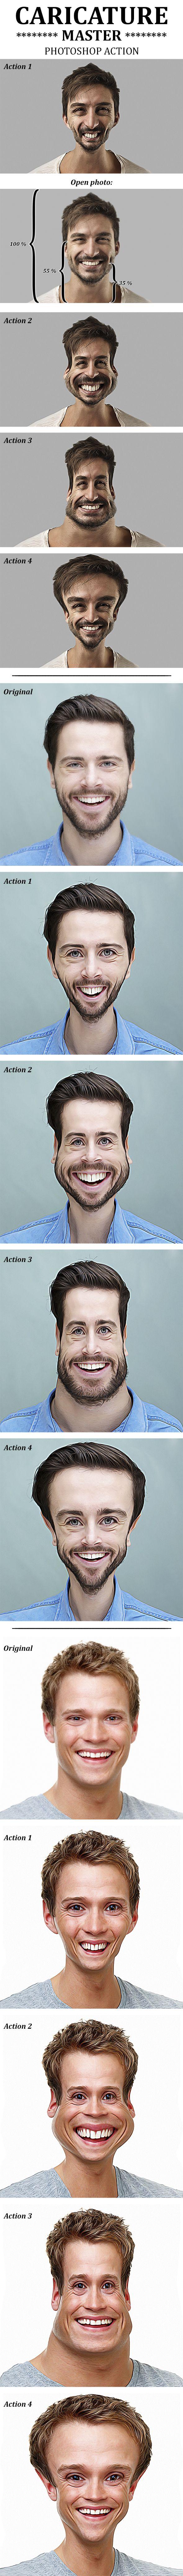 Caricature Master Photoshop Action